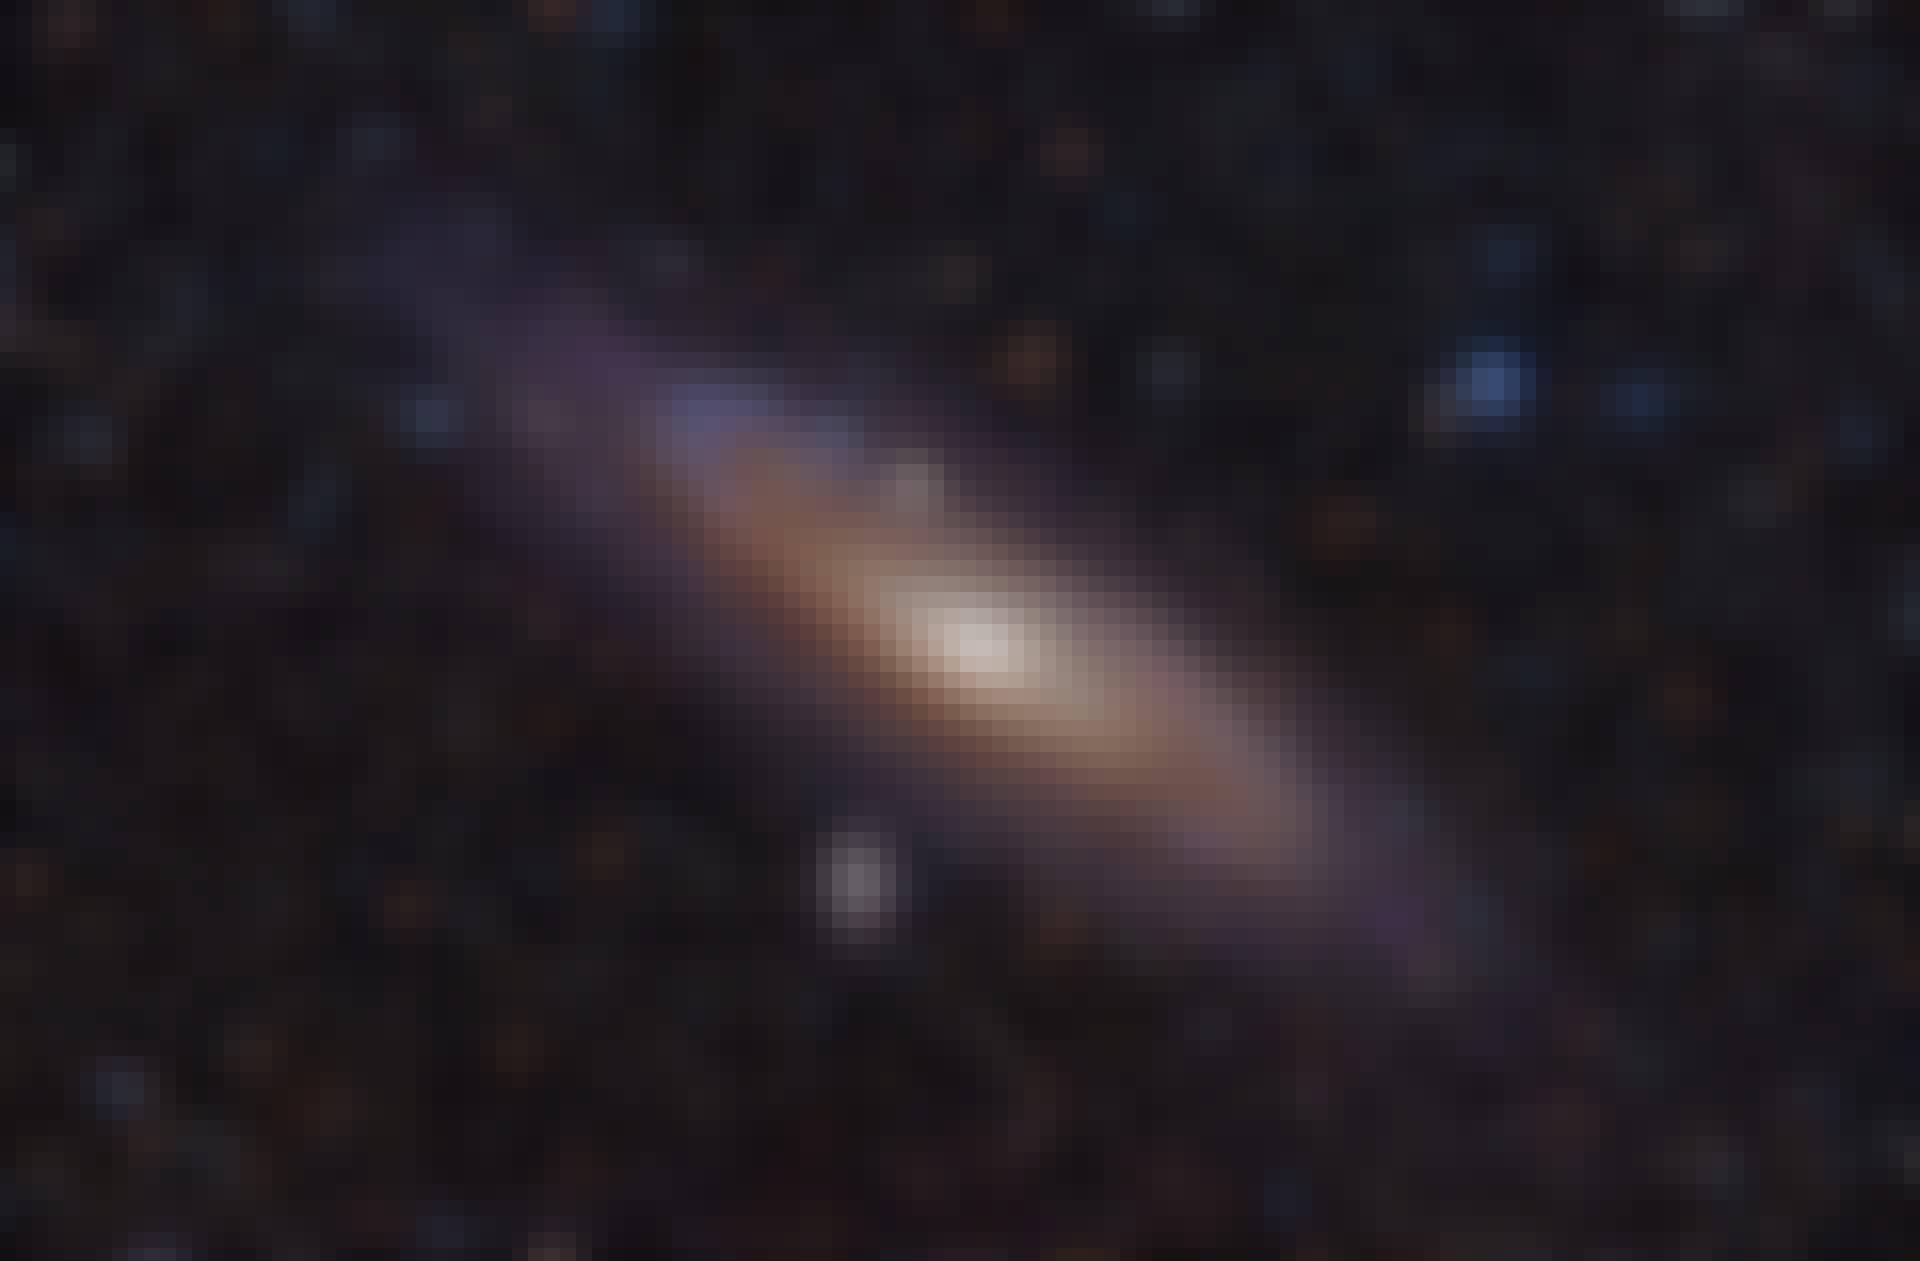 Andromedagalaksen